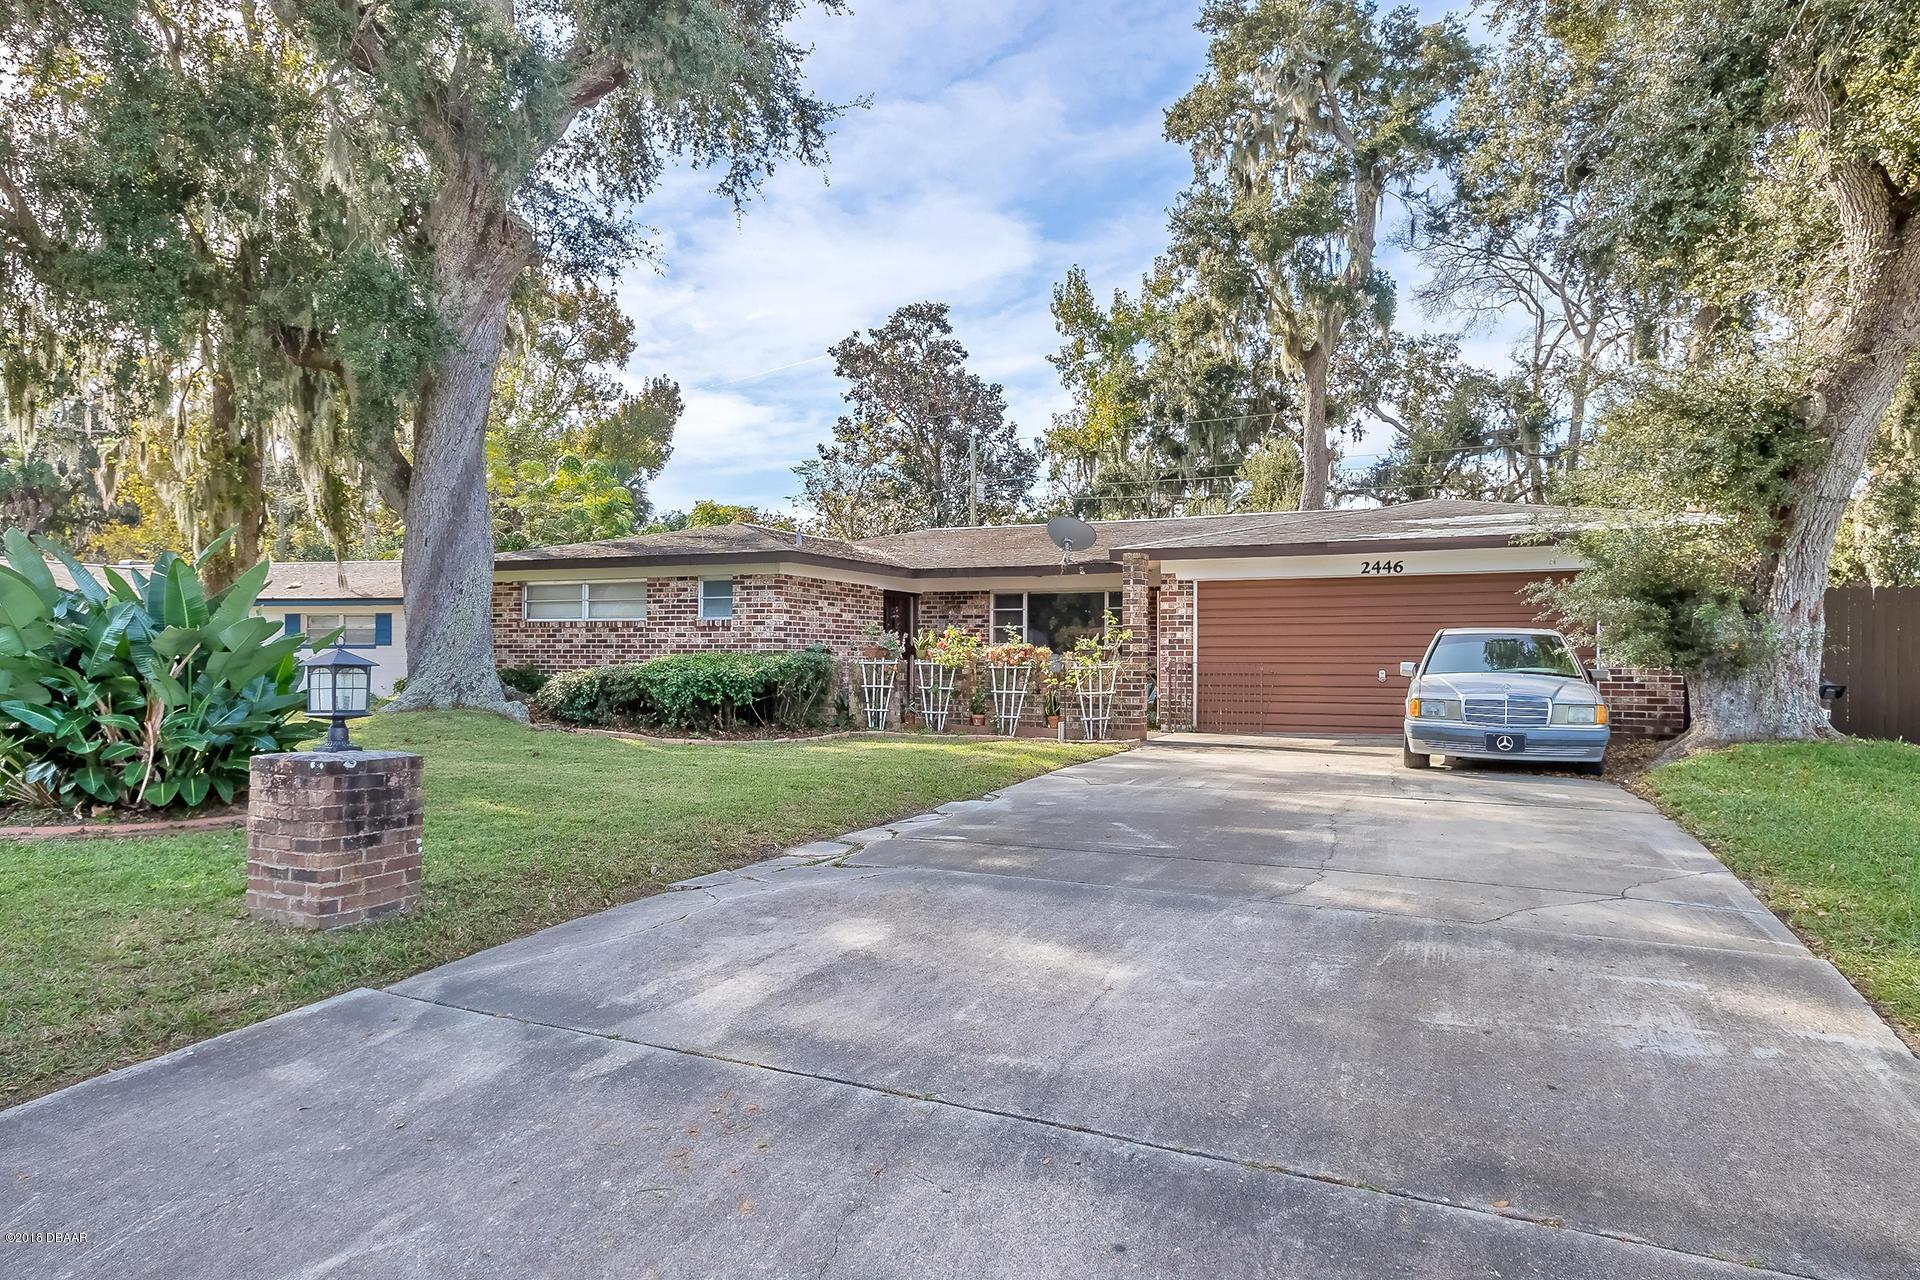 2446 Kenilworth Avenue, South Daytona, Florida